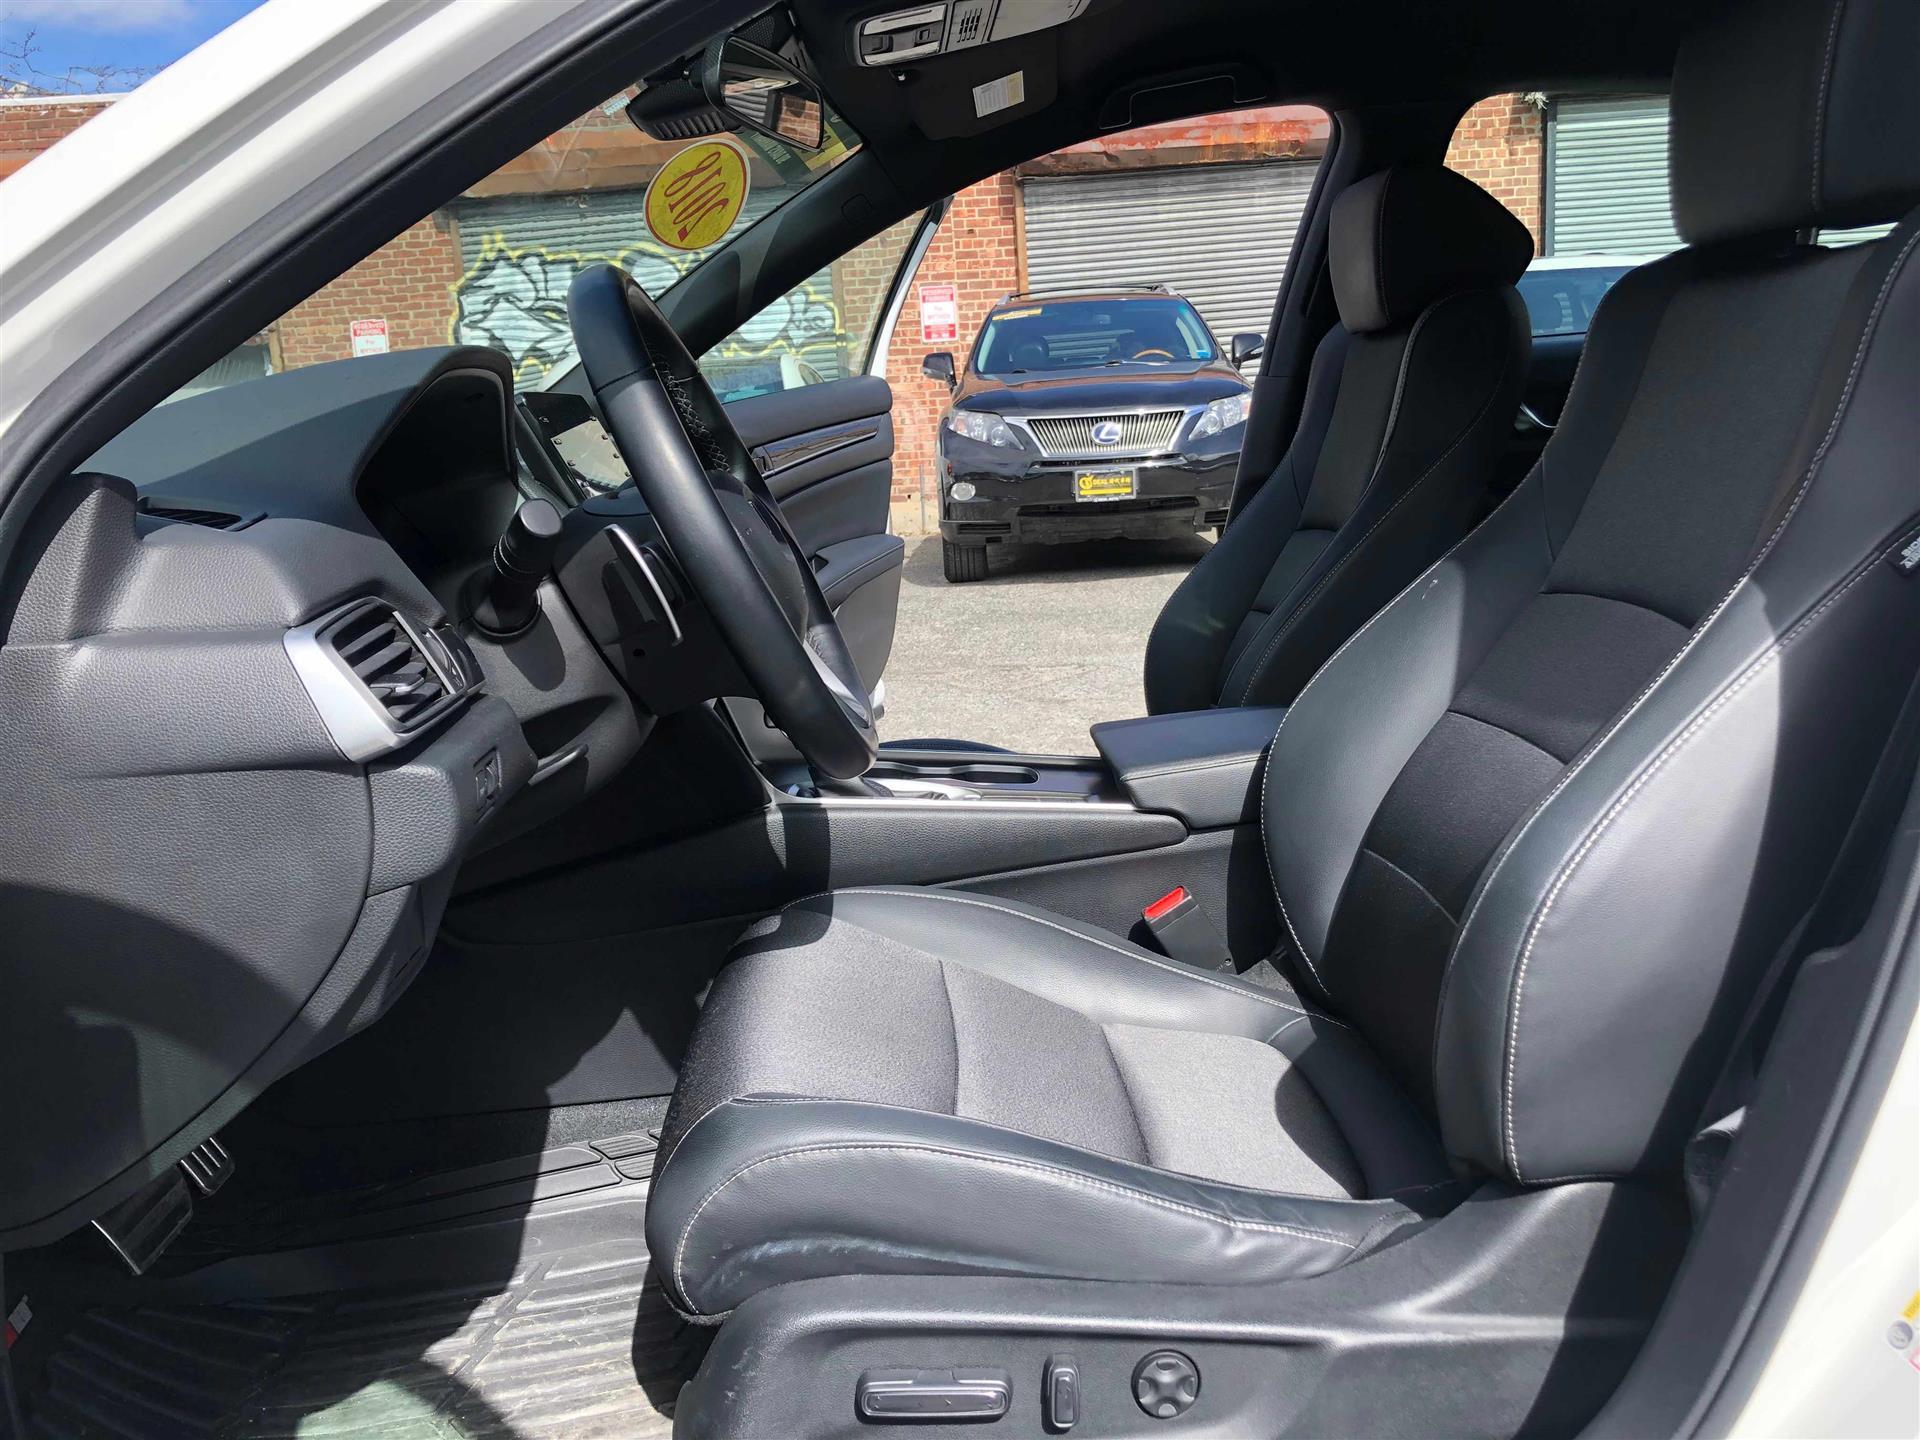 2018 Honda Accord sport新版 雅阁运动版 , 只开了17000 miles ,一首车主